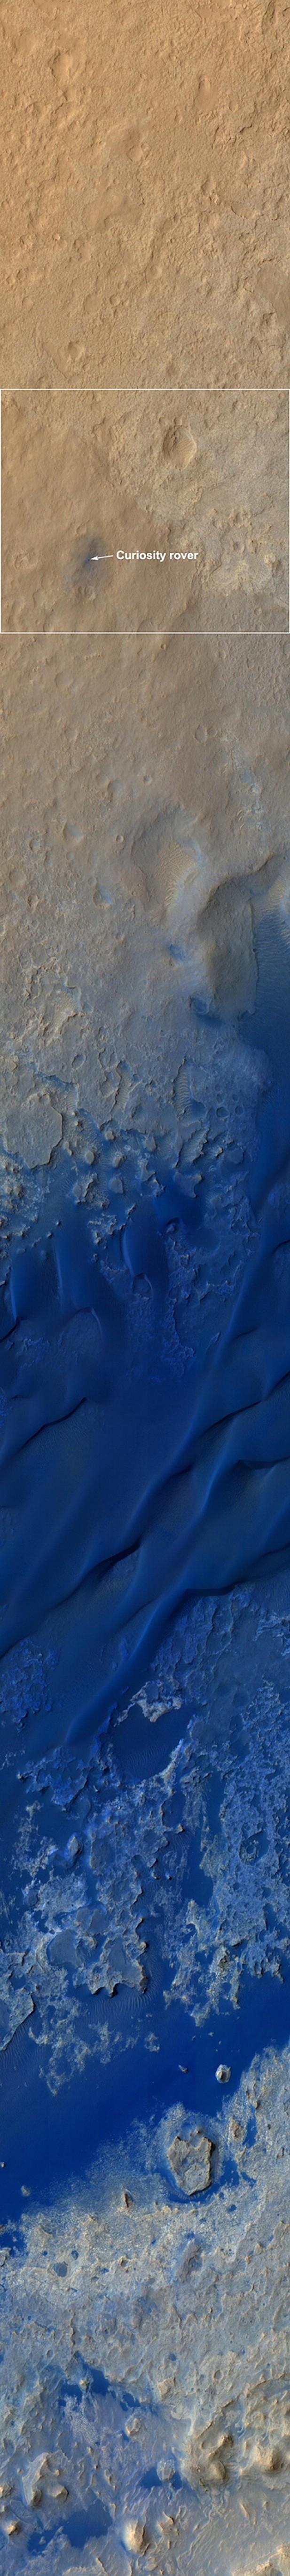 Curiosity pouso Marte (Foto: Nasa/JPL-Caltech/University of Arizona/Reuters)